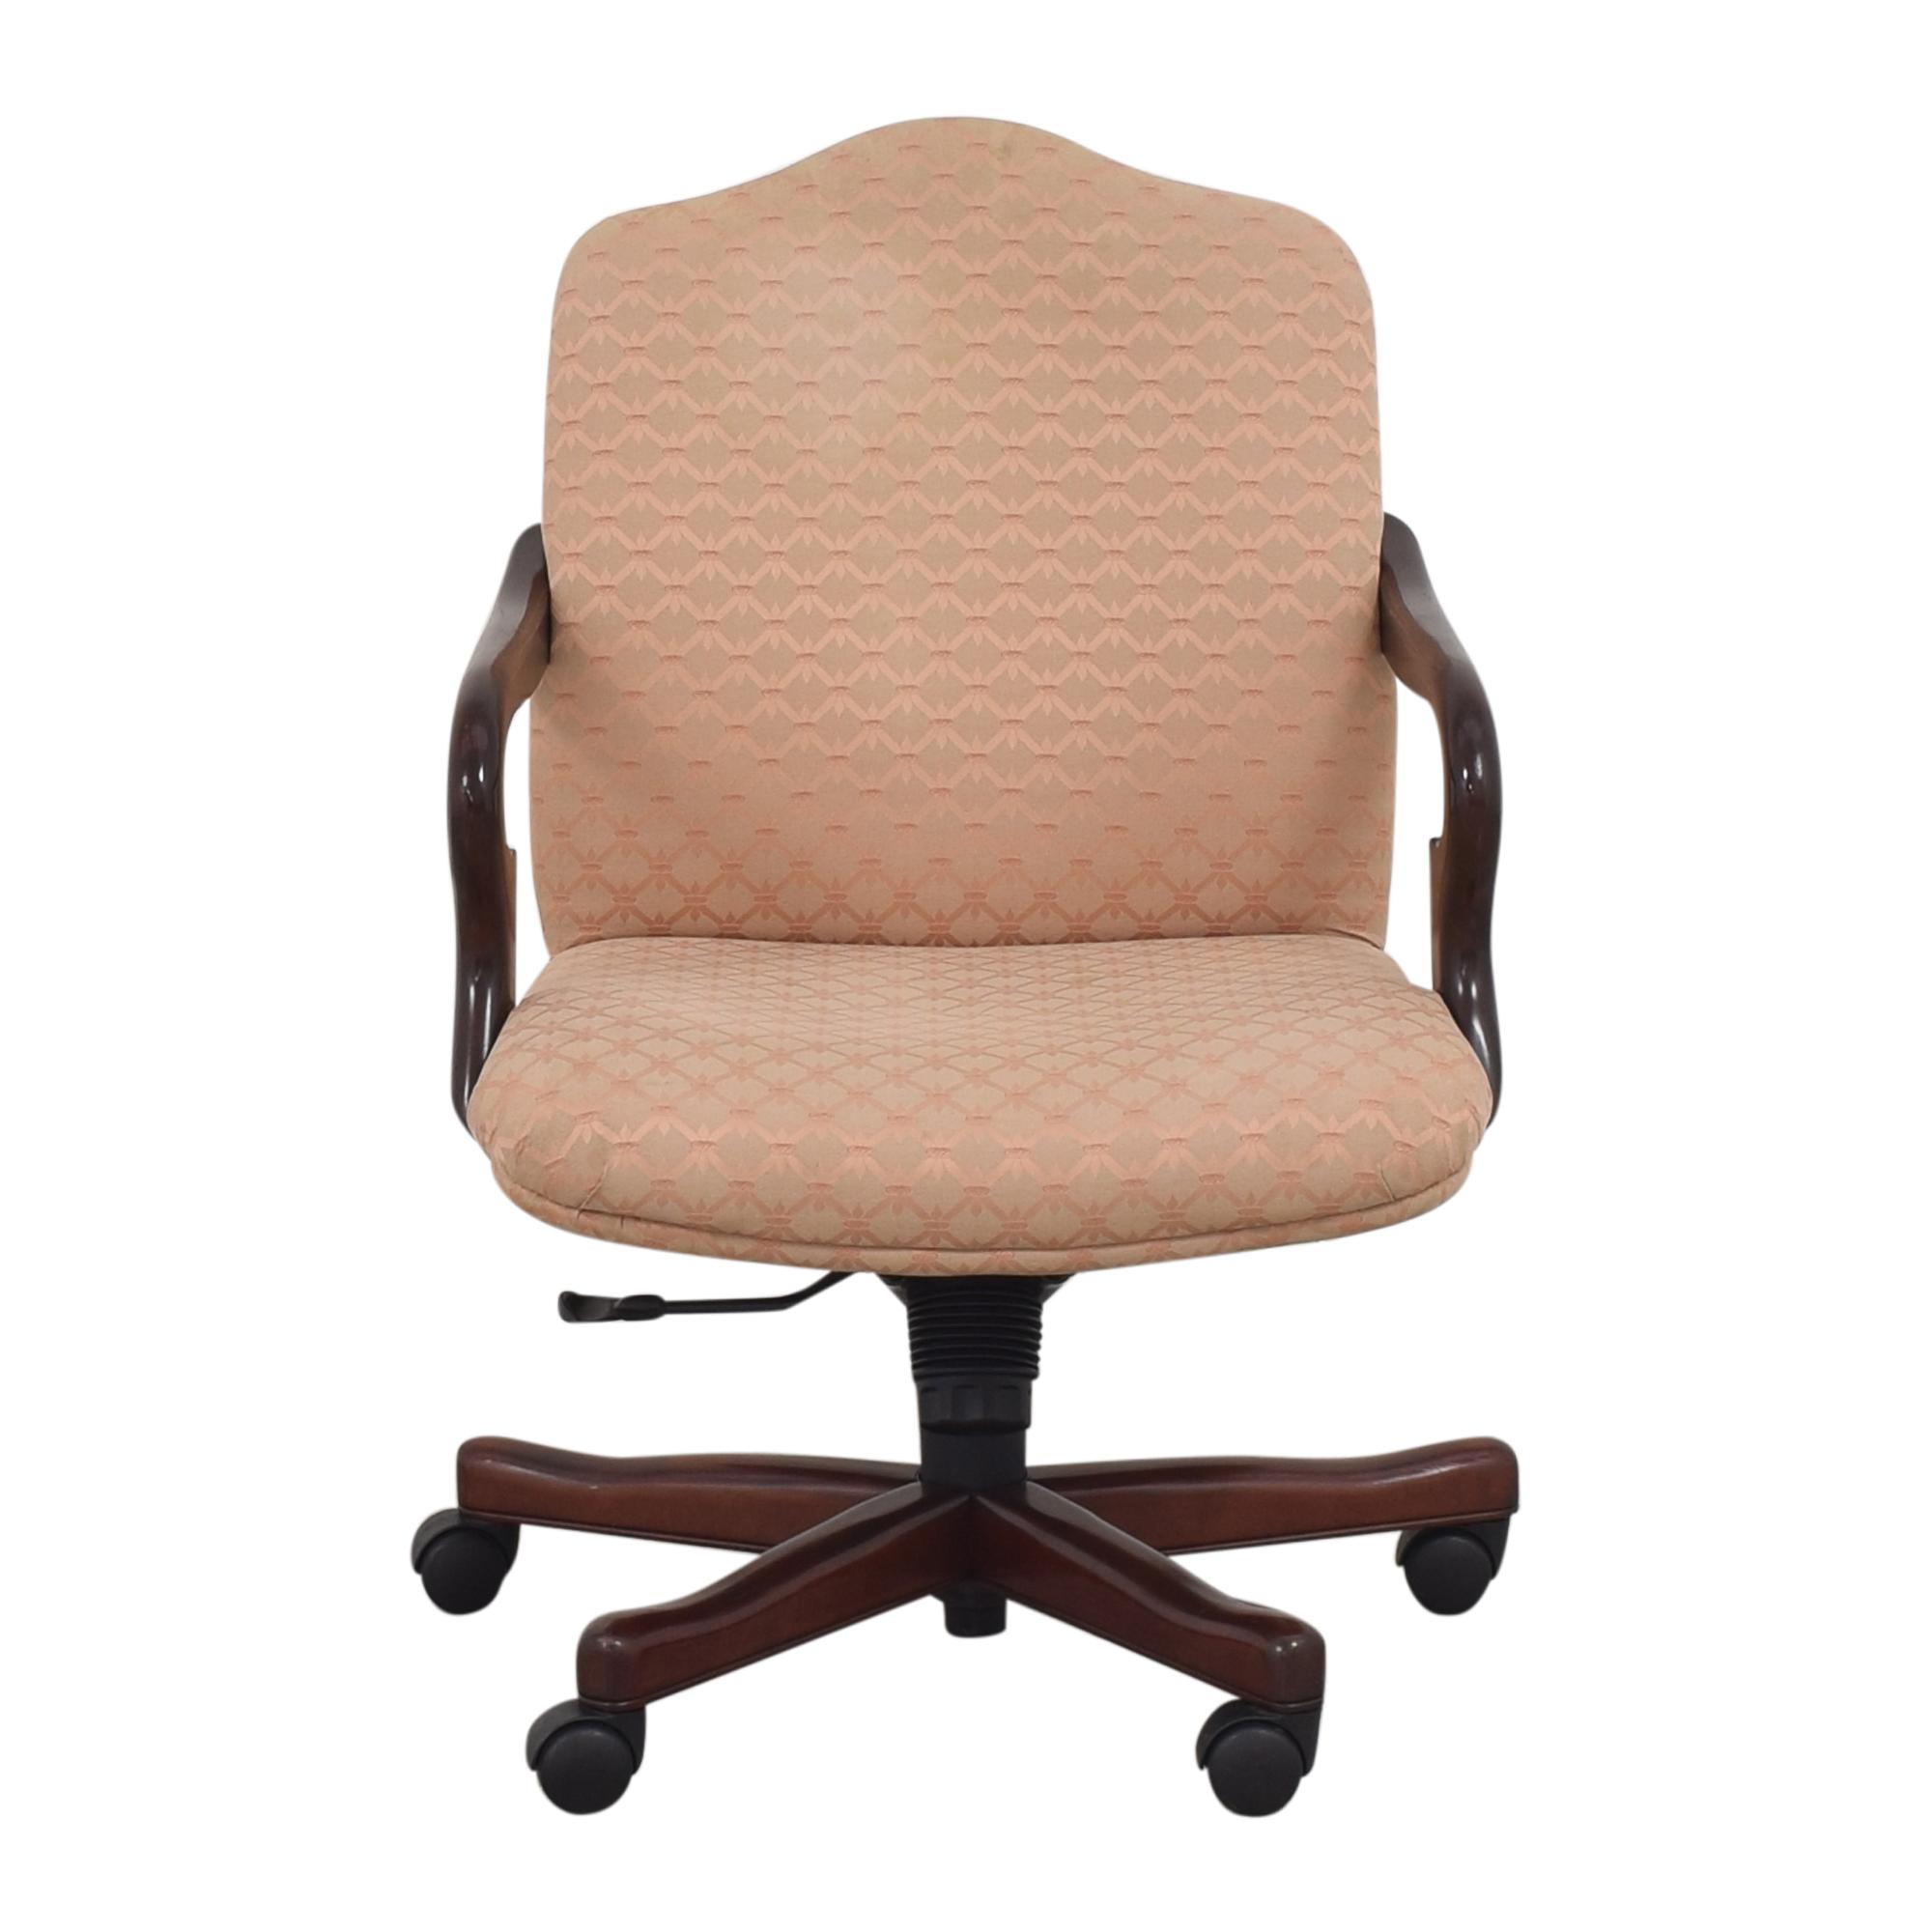 Jofco Jofco Swivel Tilt Office Chair for sale